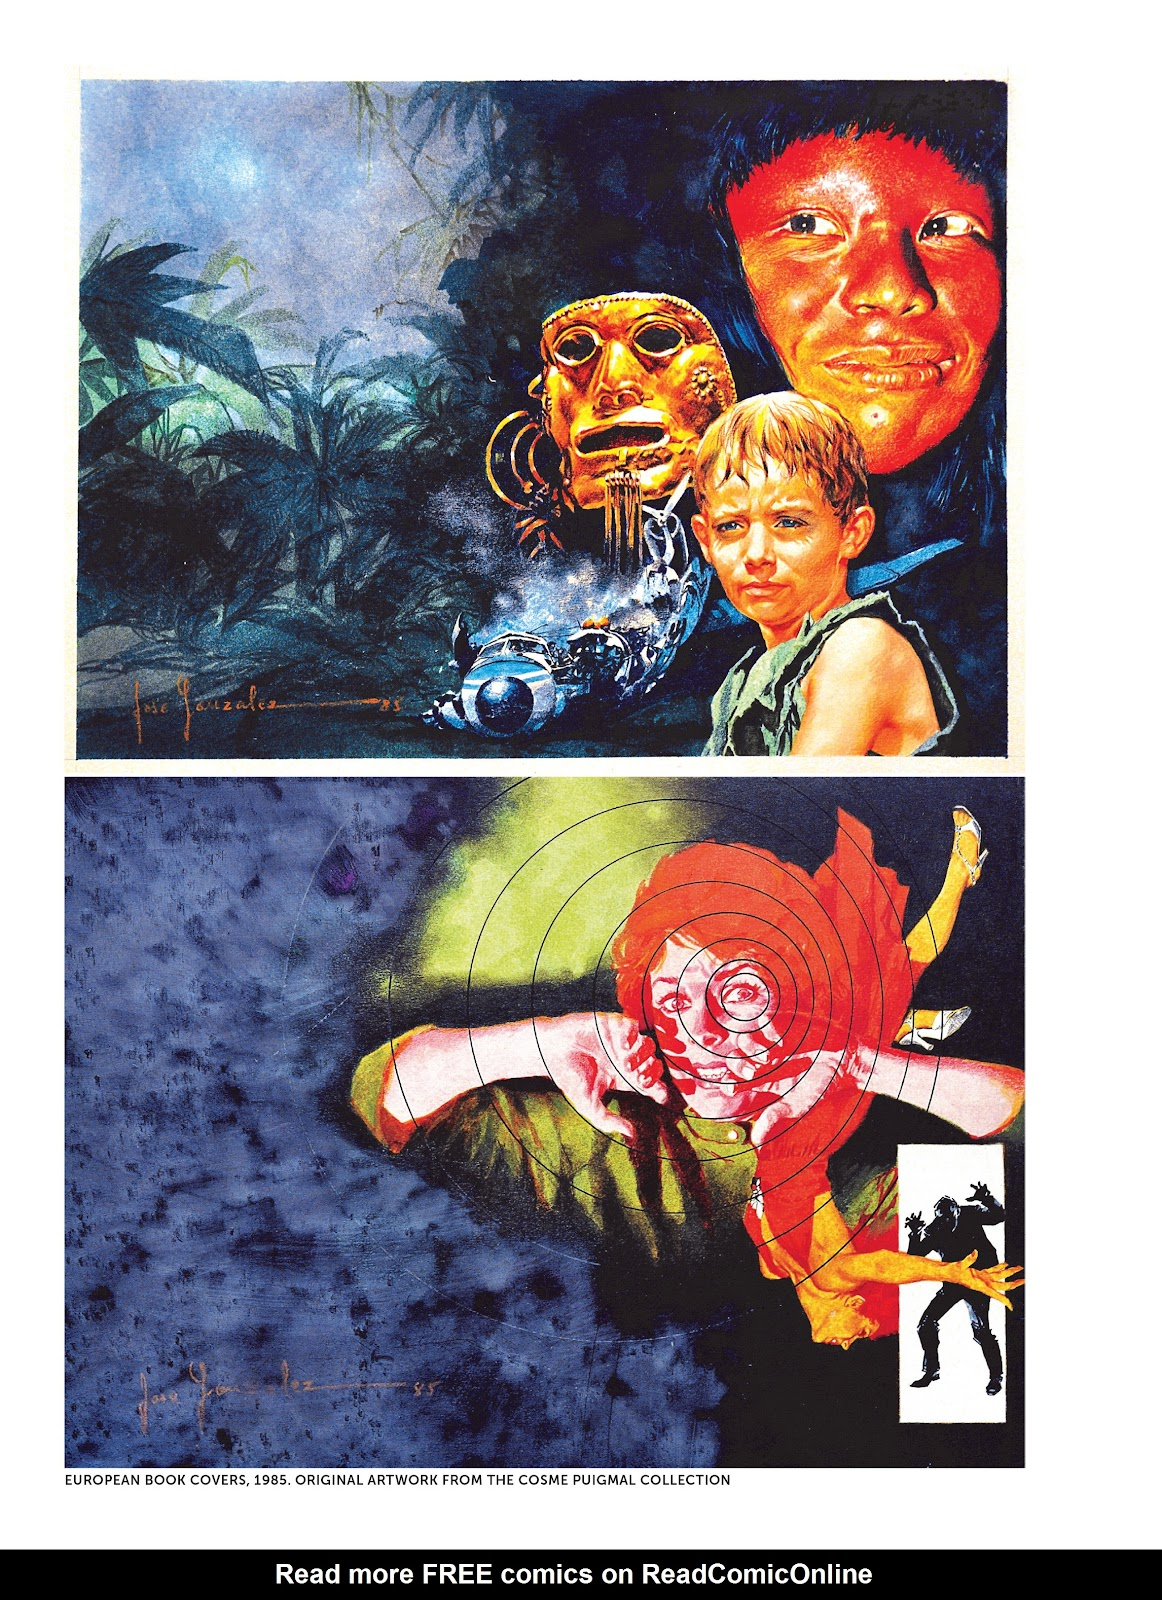 Read online The Art of Jose Gonzalez comic -  Issue # TPB (Part 3) - 15